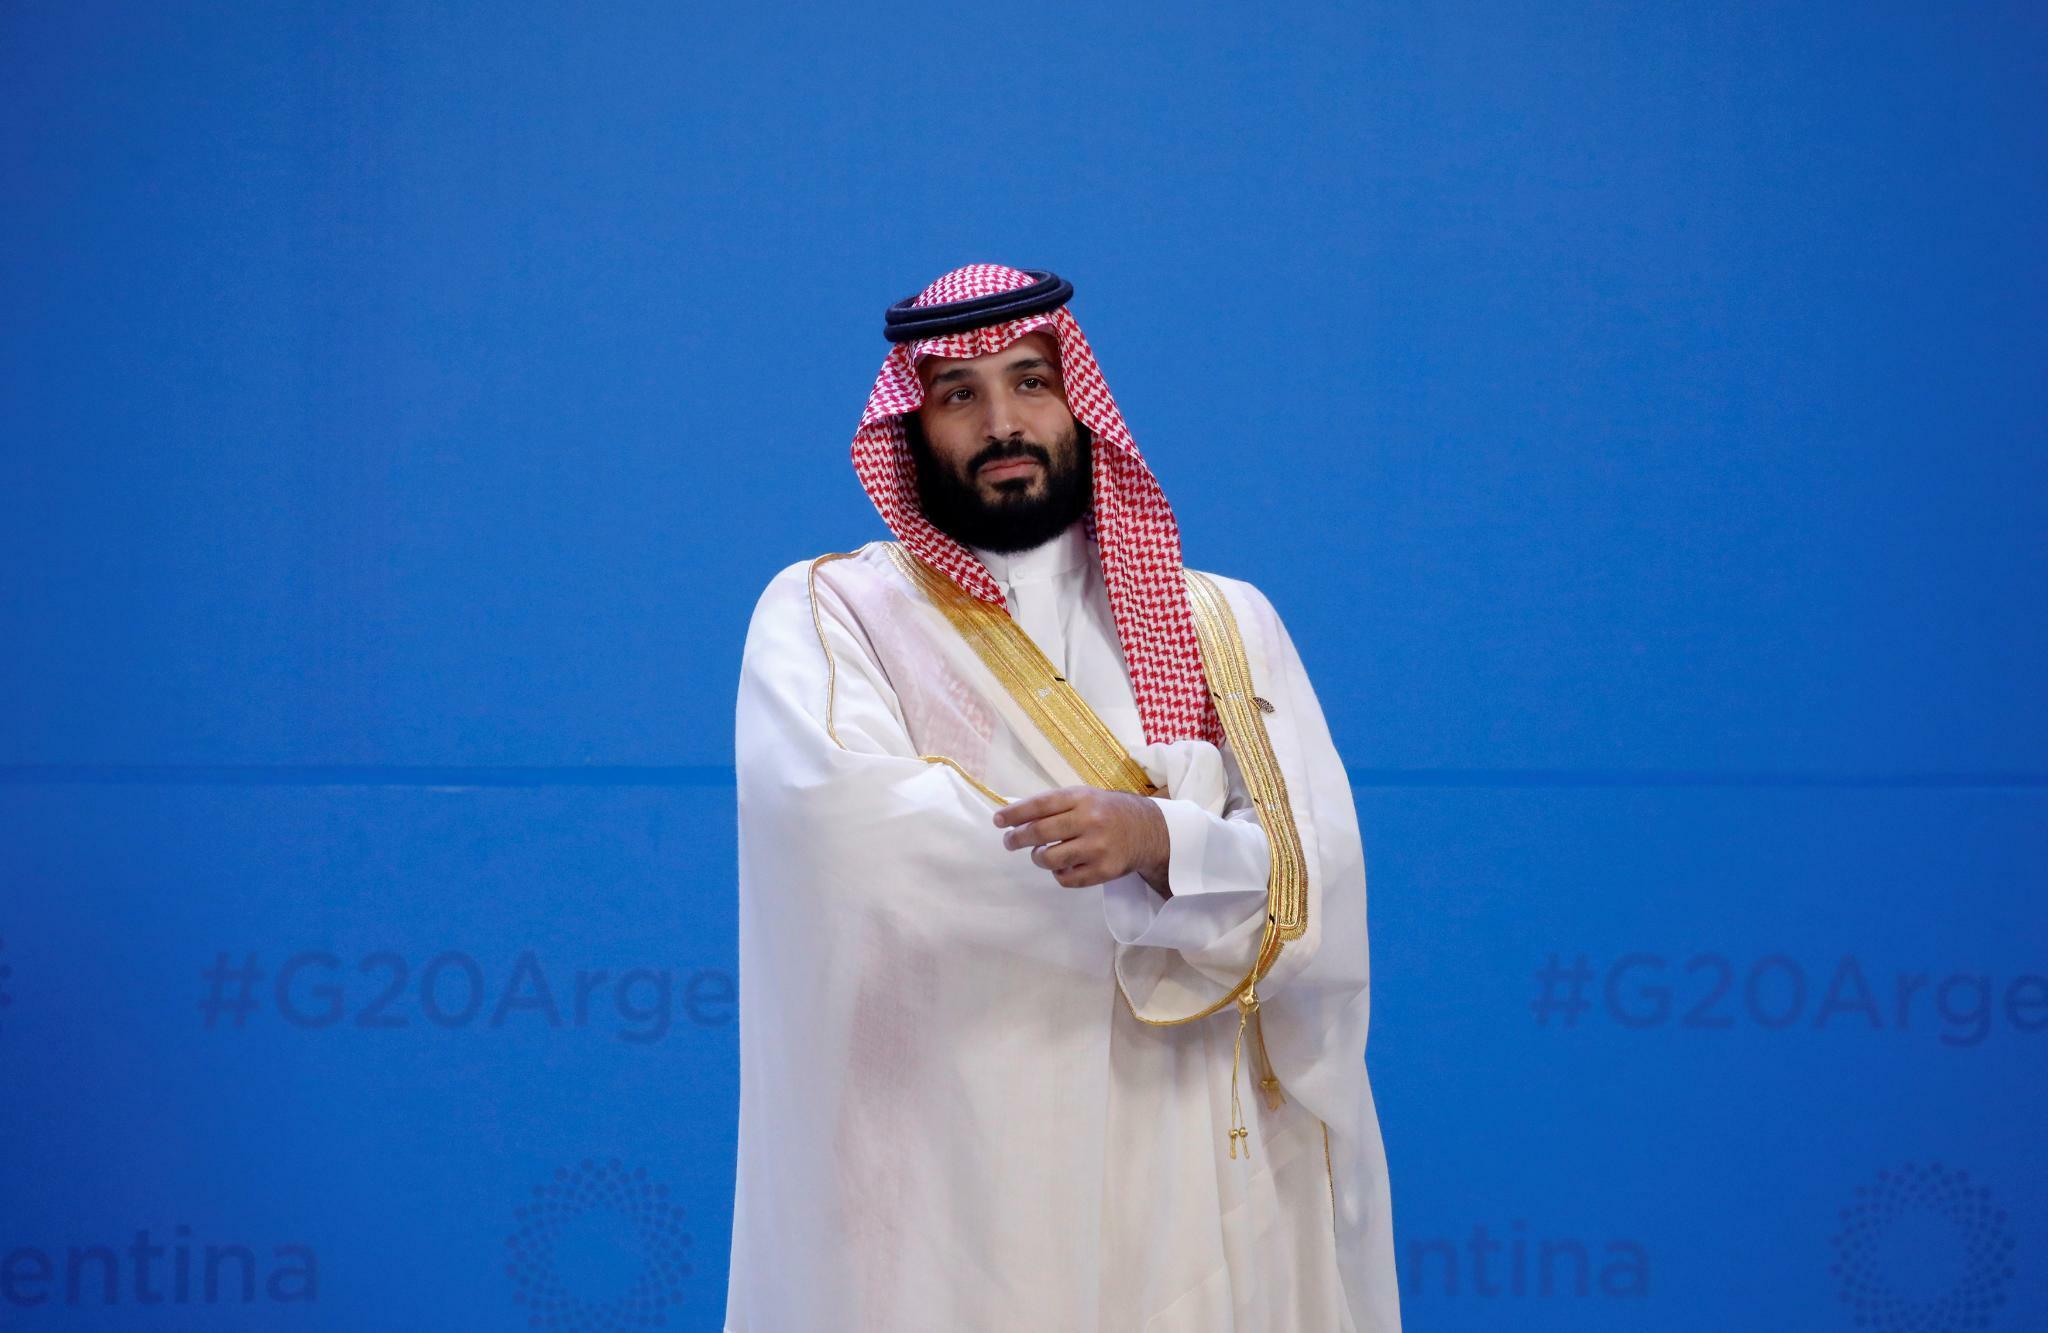 G20: Saudi-Arabien übernimmt Vorsitz – Harte Kritik